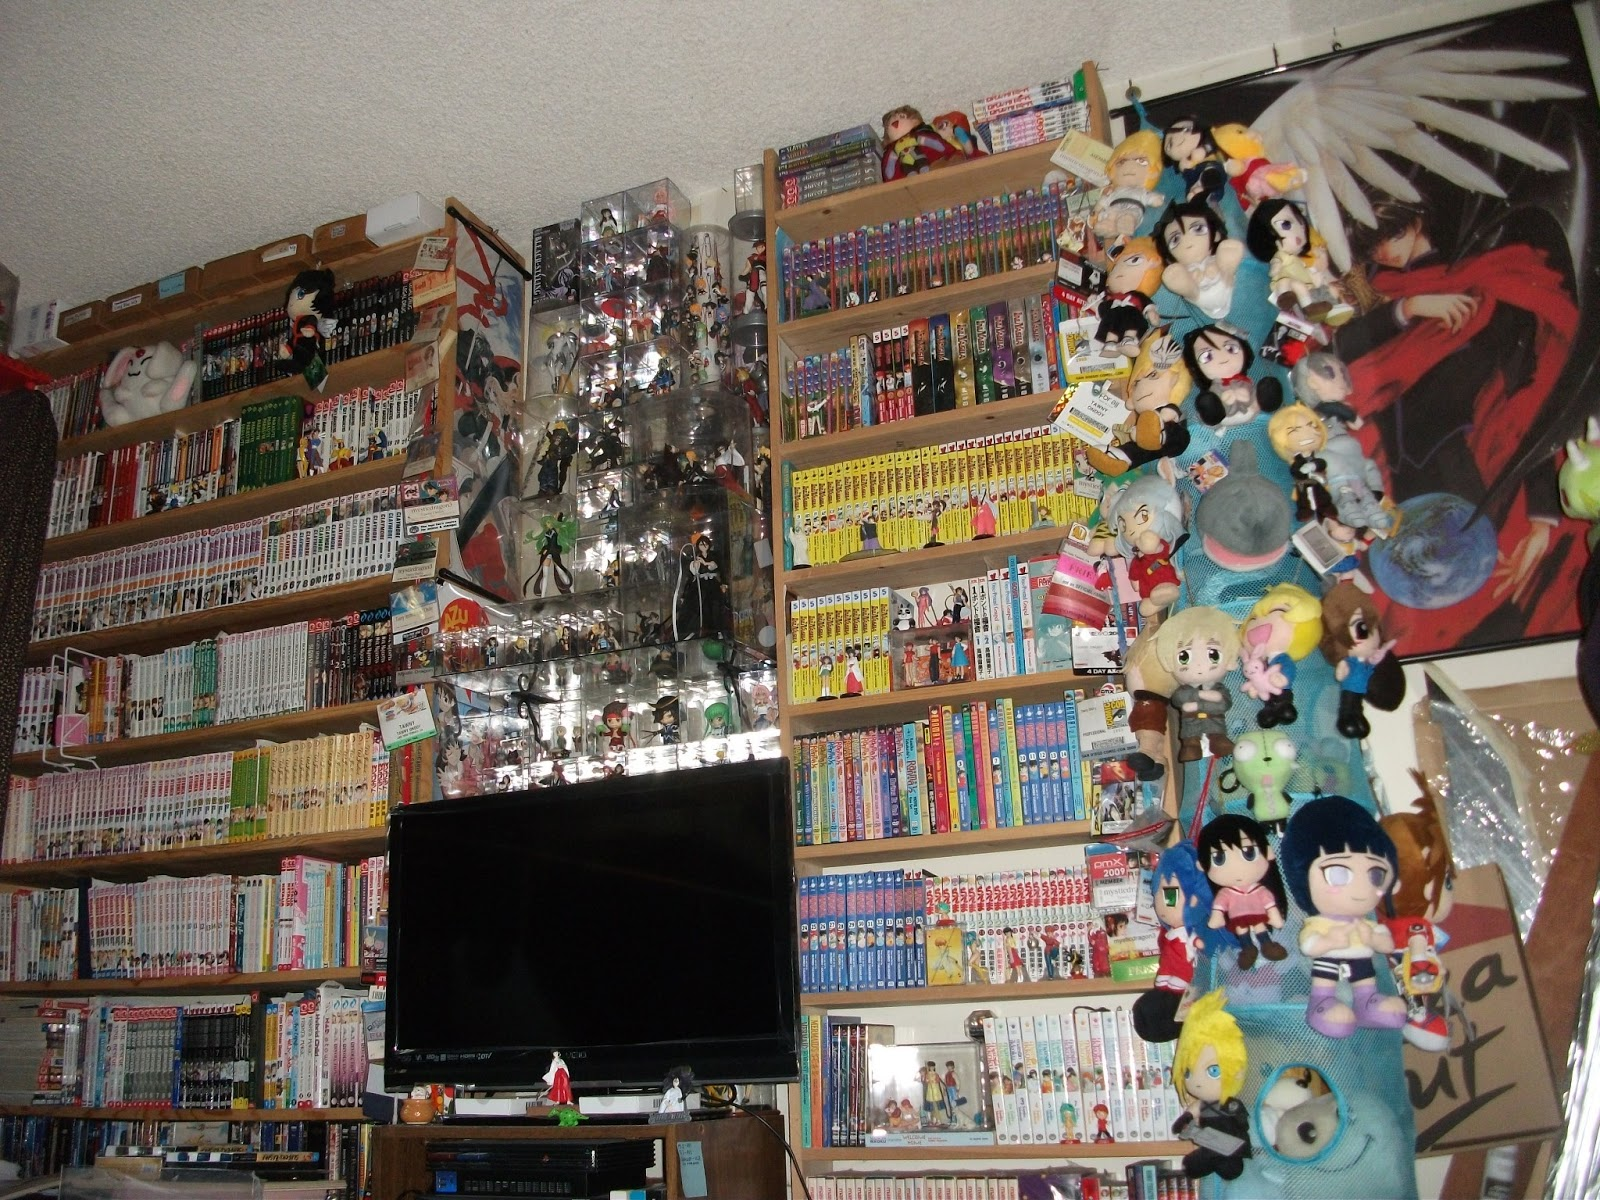 timid otaku anime manga videogames fan art cosplay geeky